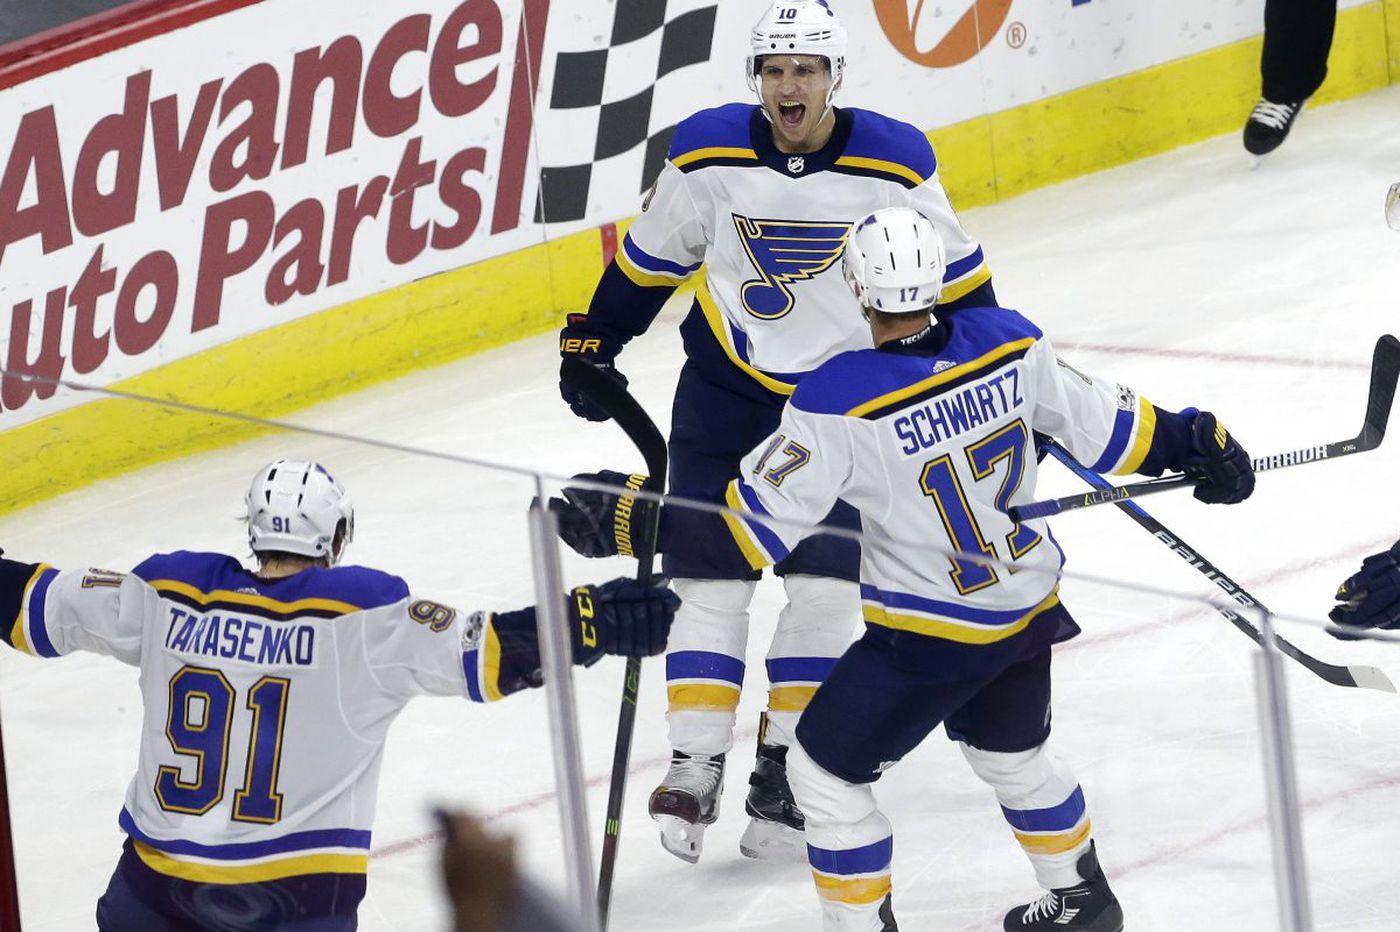 Jori Lehtera, Brayden Schenn will face old teams when Flyers play Blues